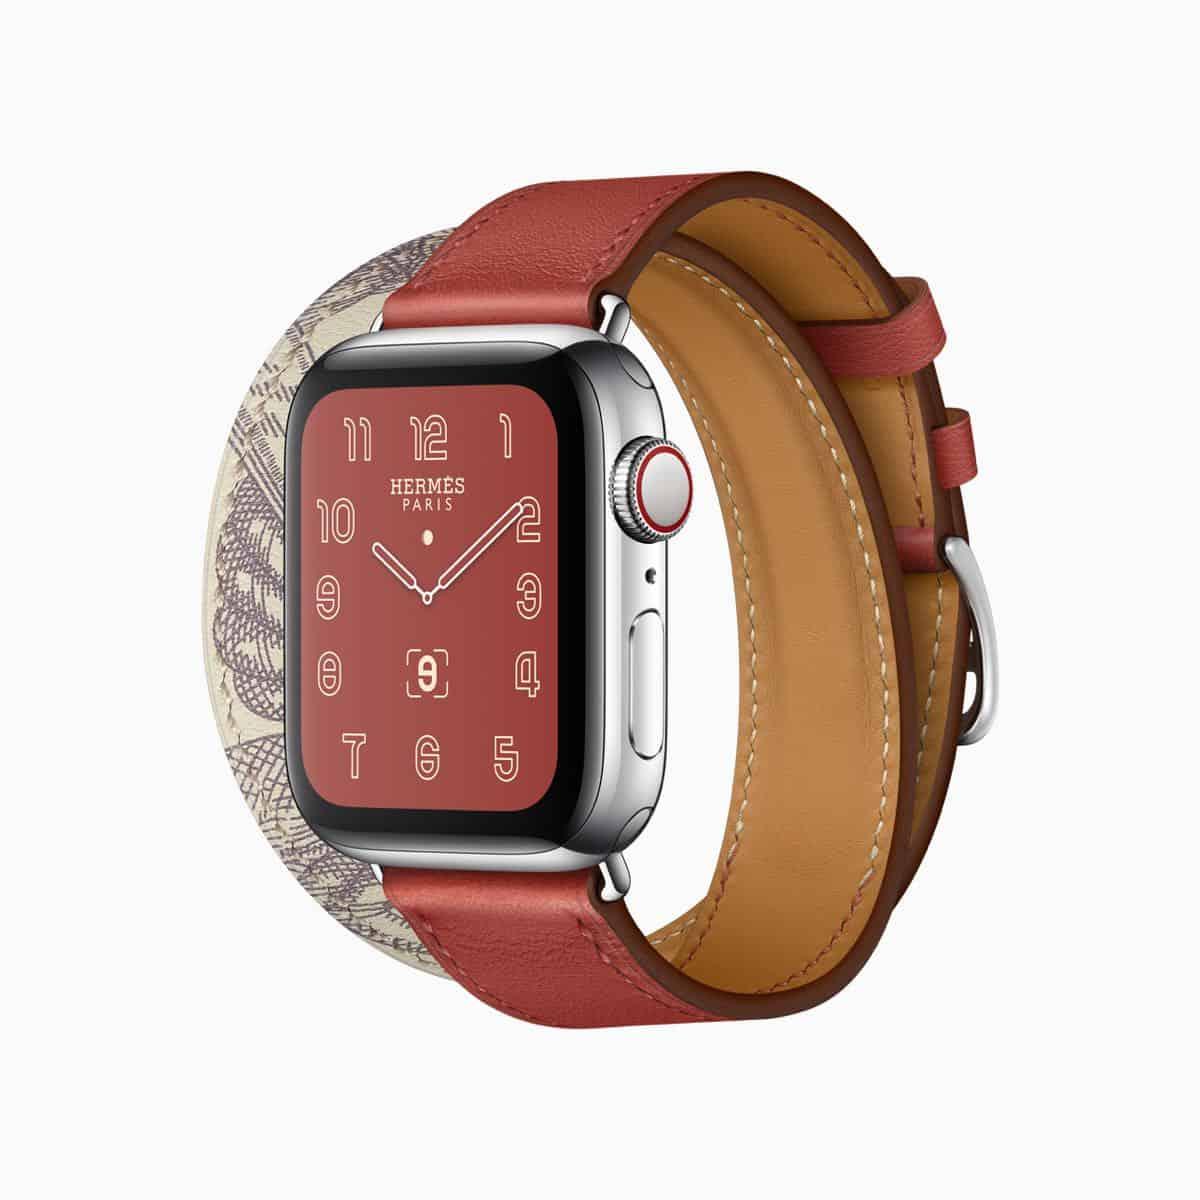 Apple watch series 5 hermes face double tour della cavalleria print brique beton grey band 091019